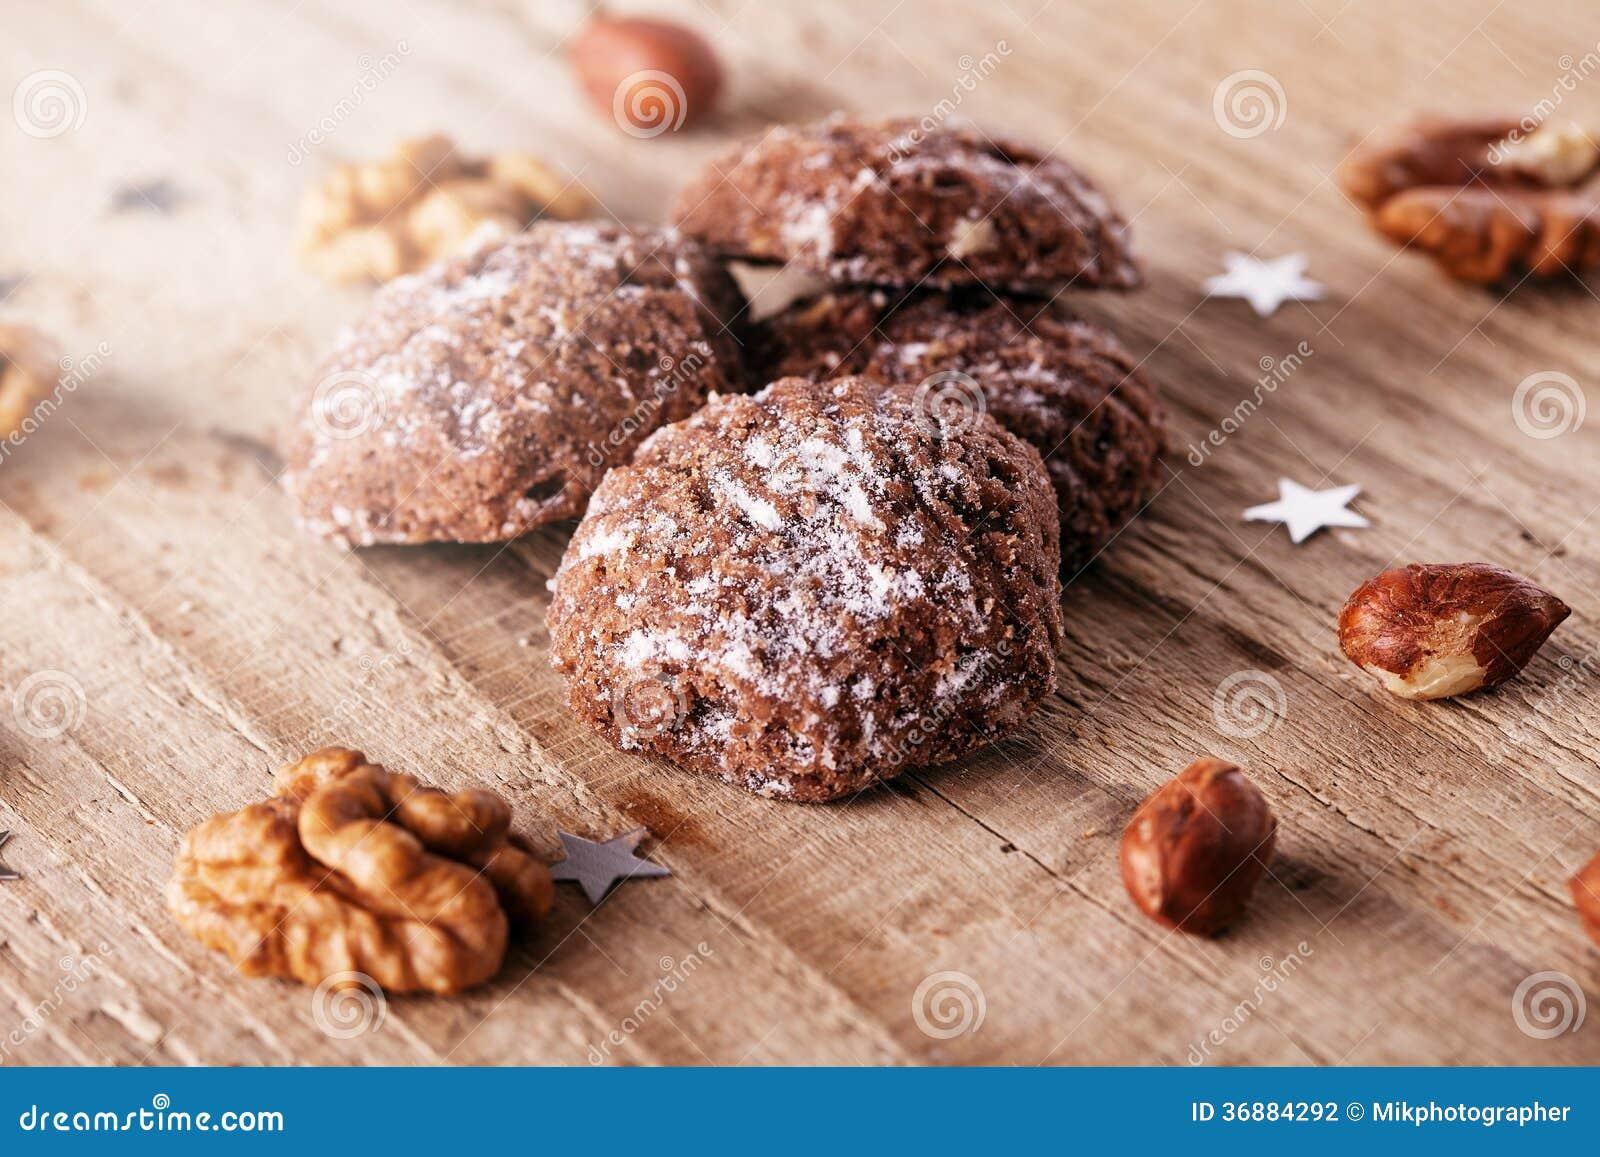 Download Biscotti di Natale fotografia stock. Immagine di closeup - 36884292